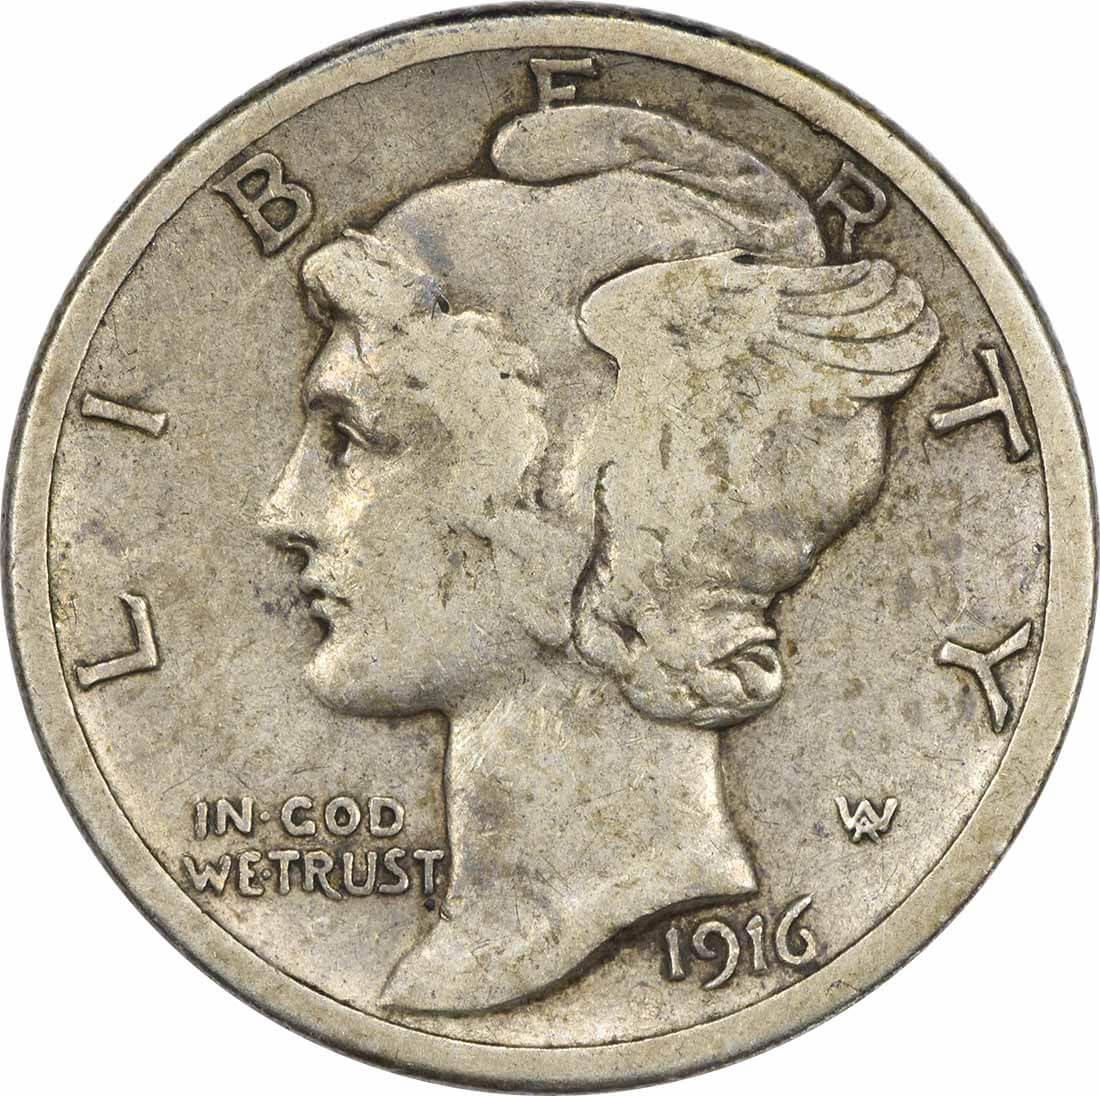 1916-S Mercury Silver Dime VF Uncertified